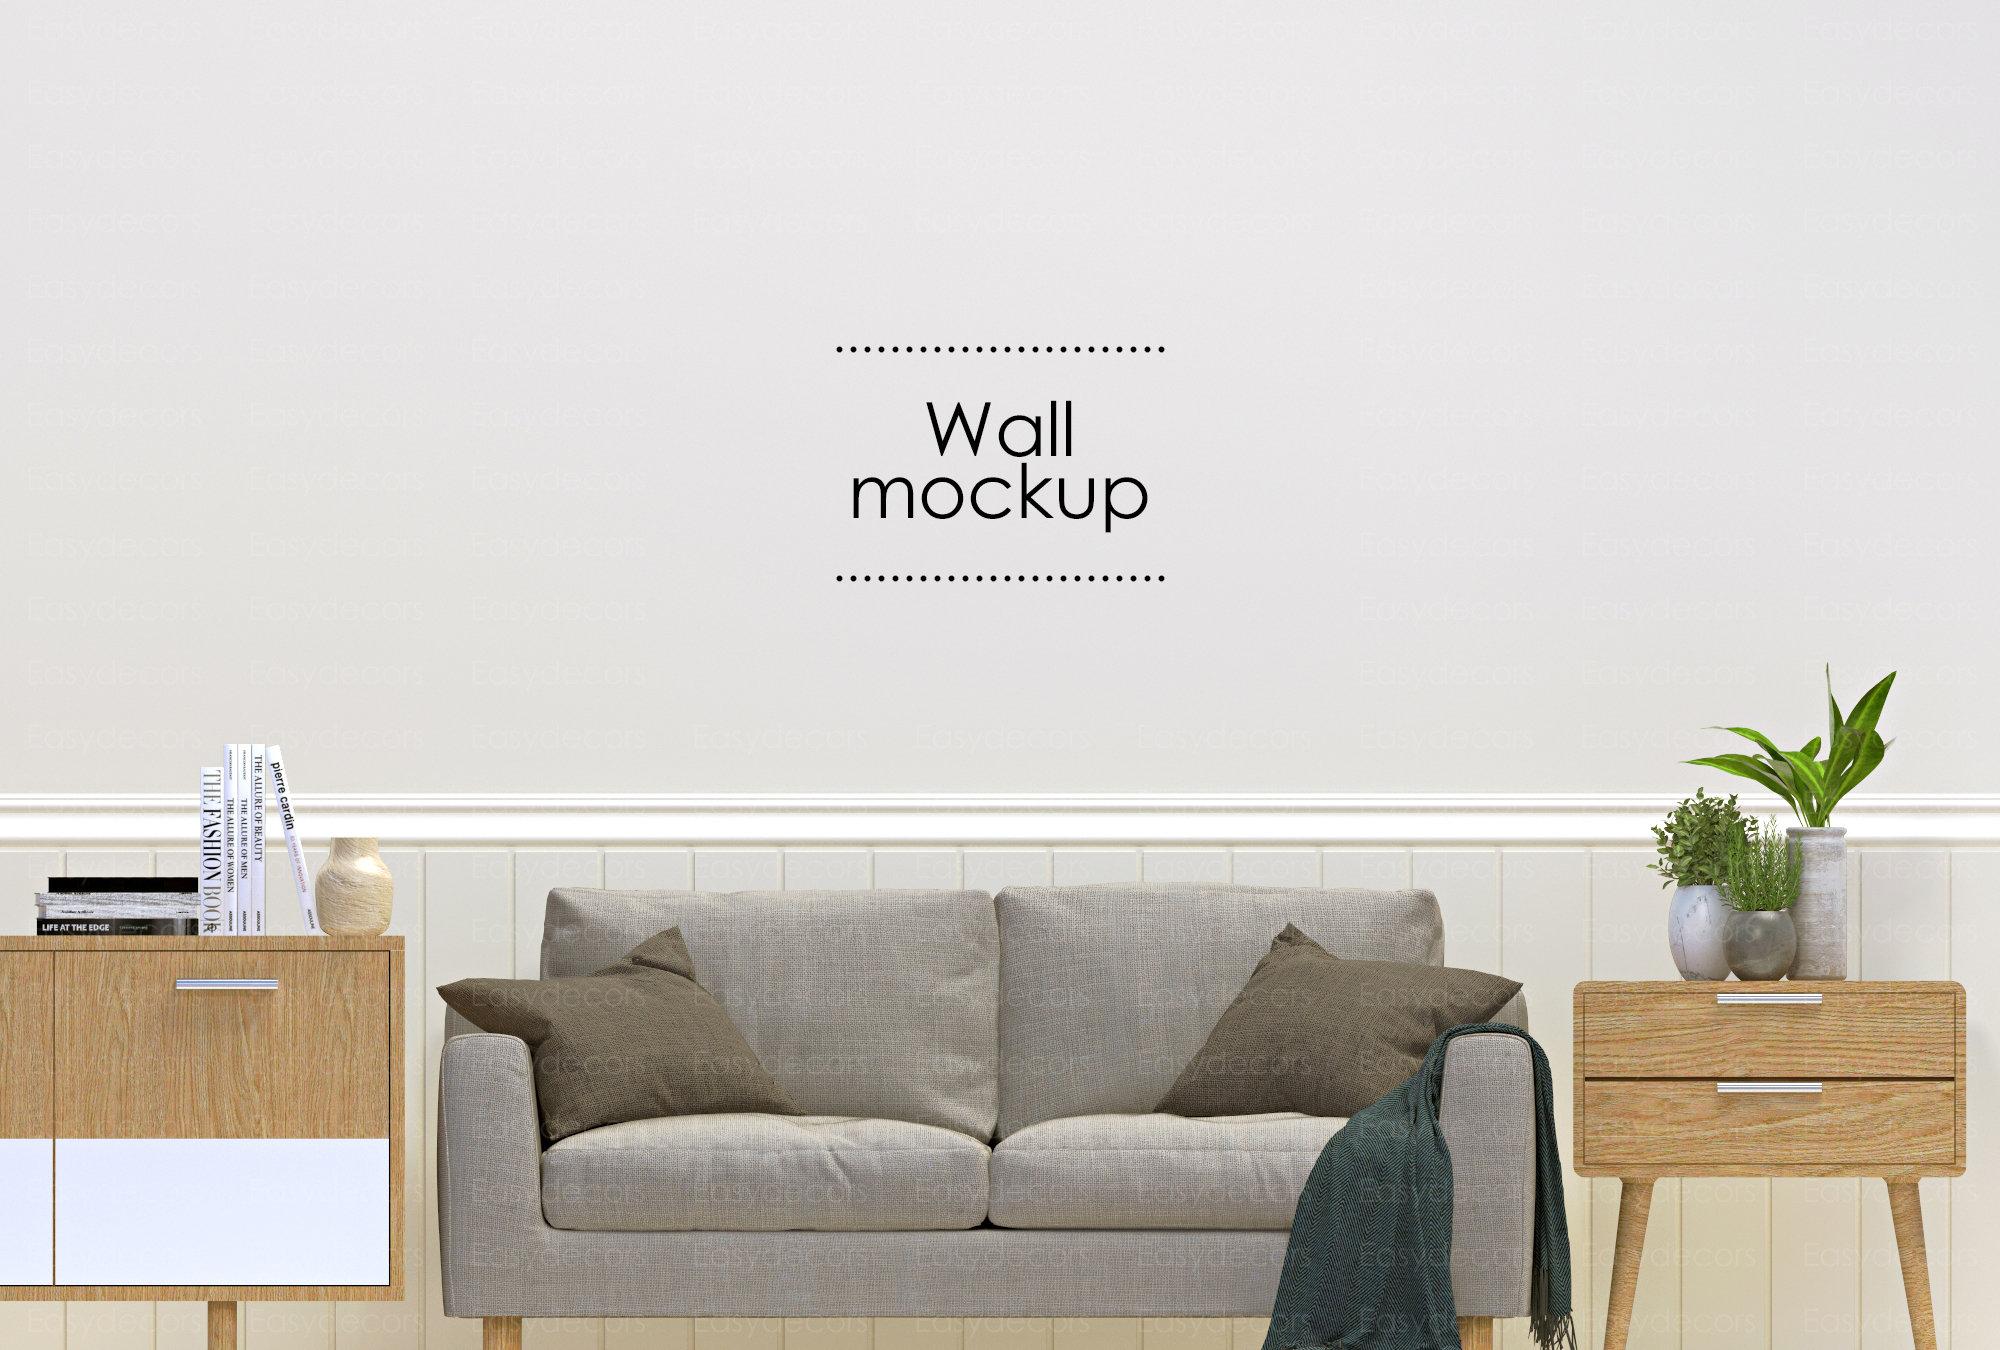 Digital Art Mockup Empty Wall Mockup Interior Mockup Download Wall Art Mockup JPG Interior Mockup Wall Mockup